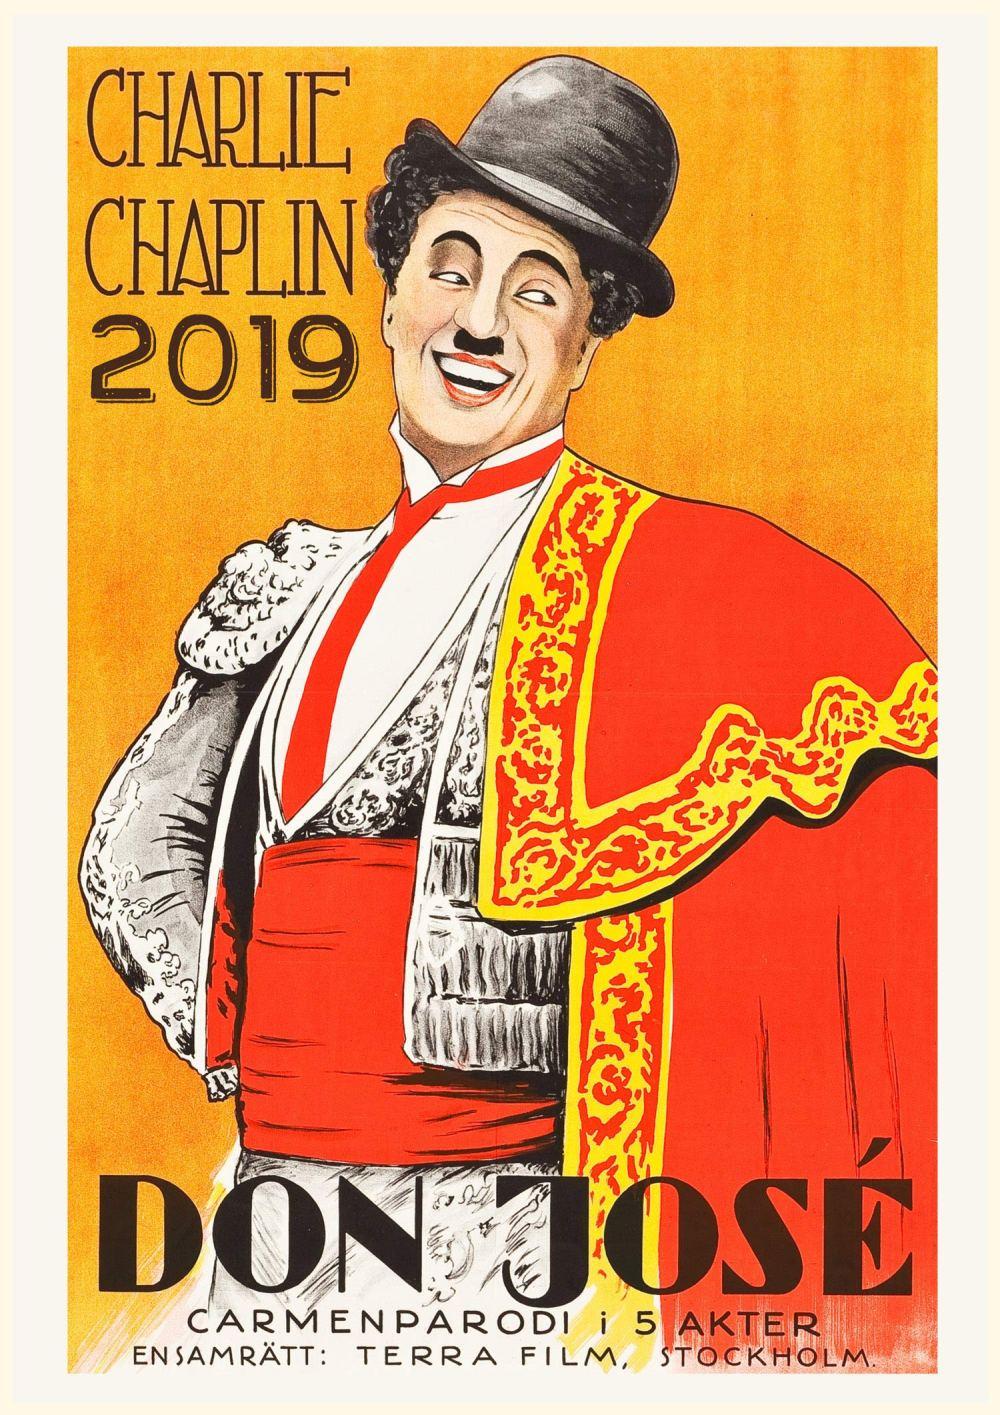 2019 Wall Calendar Charlie Chaplin Vintage Movies Posters